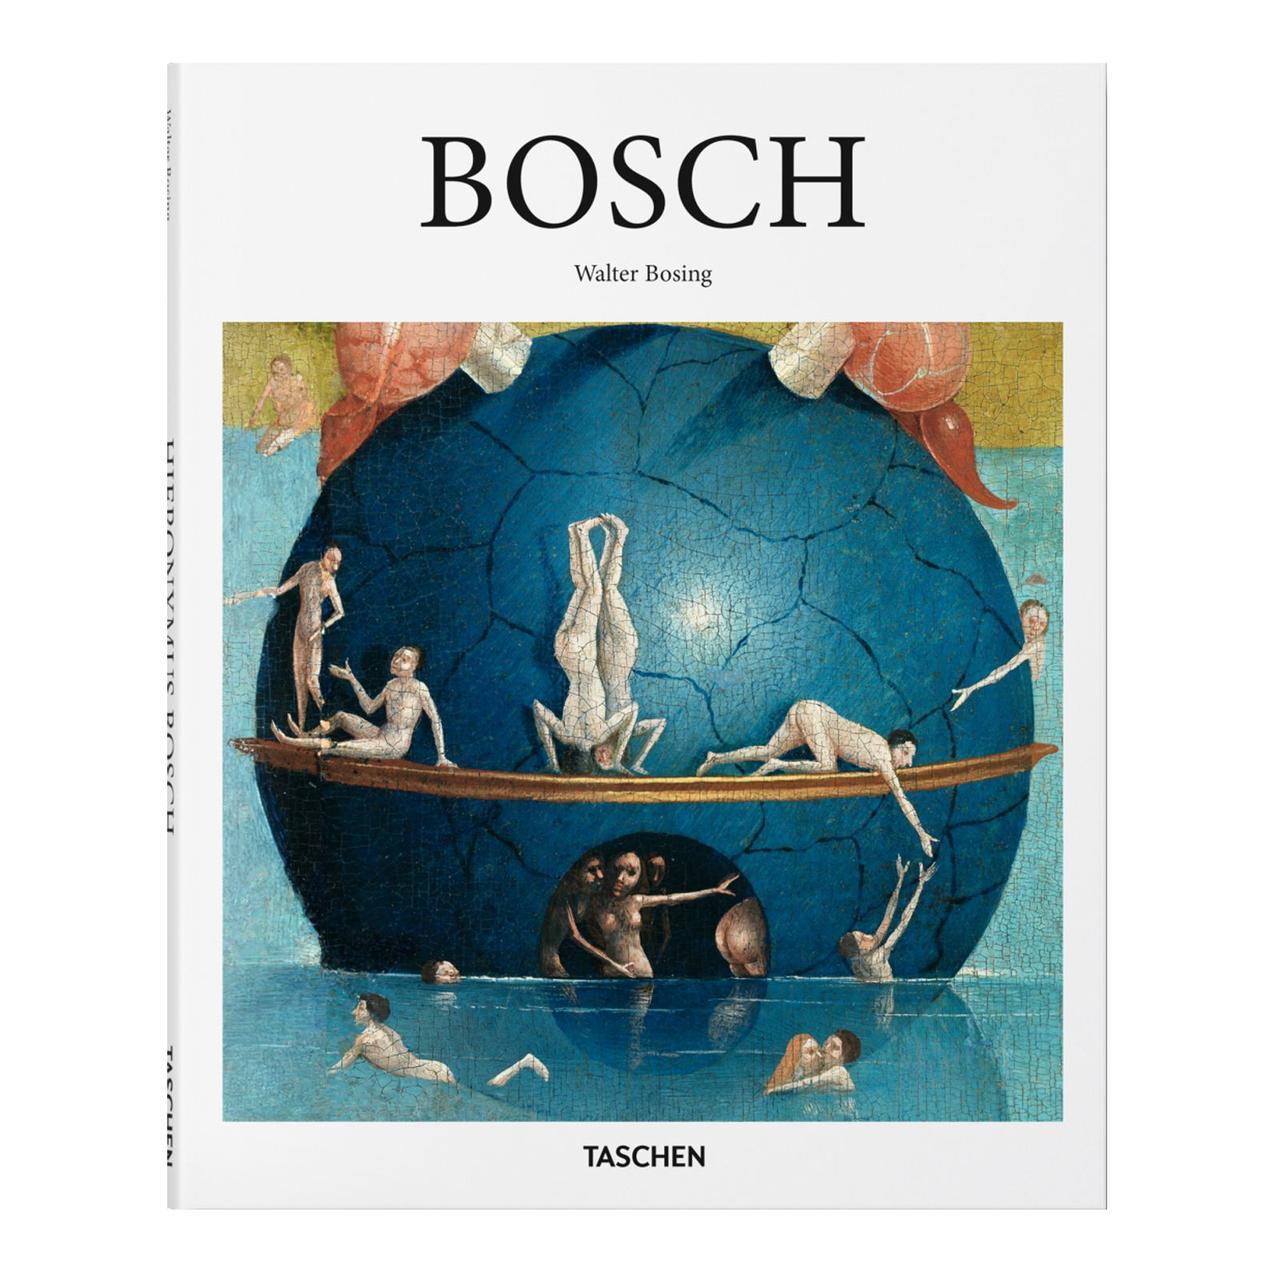 Bosch by Walter Bosing.